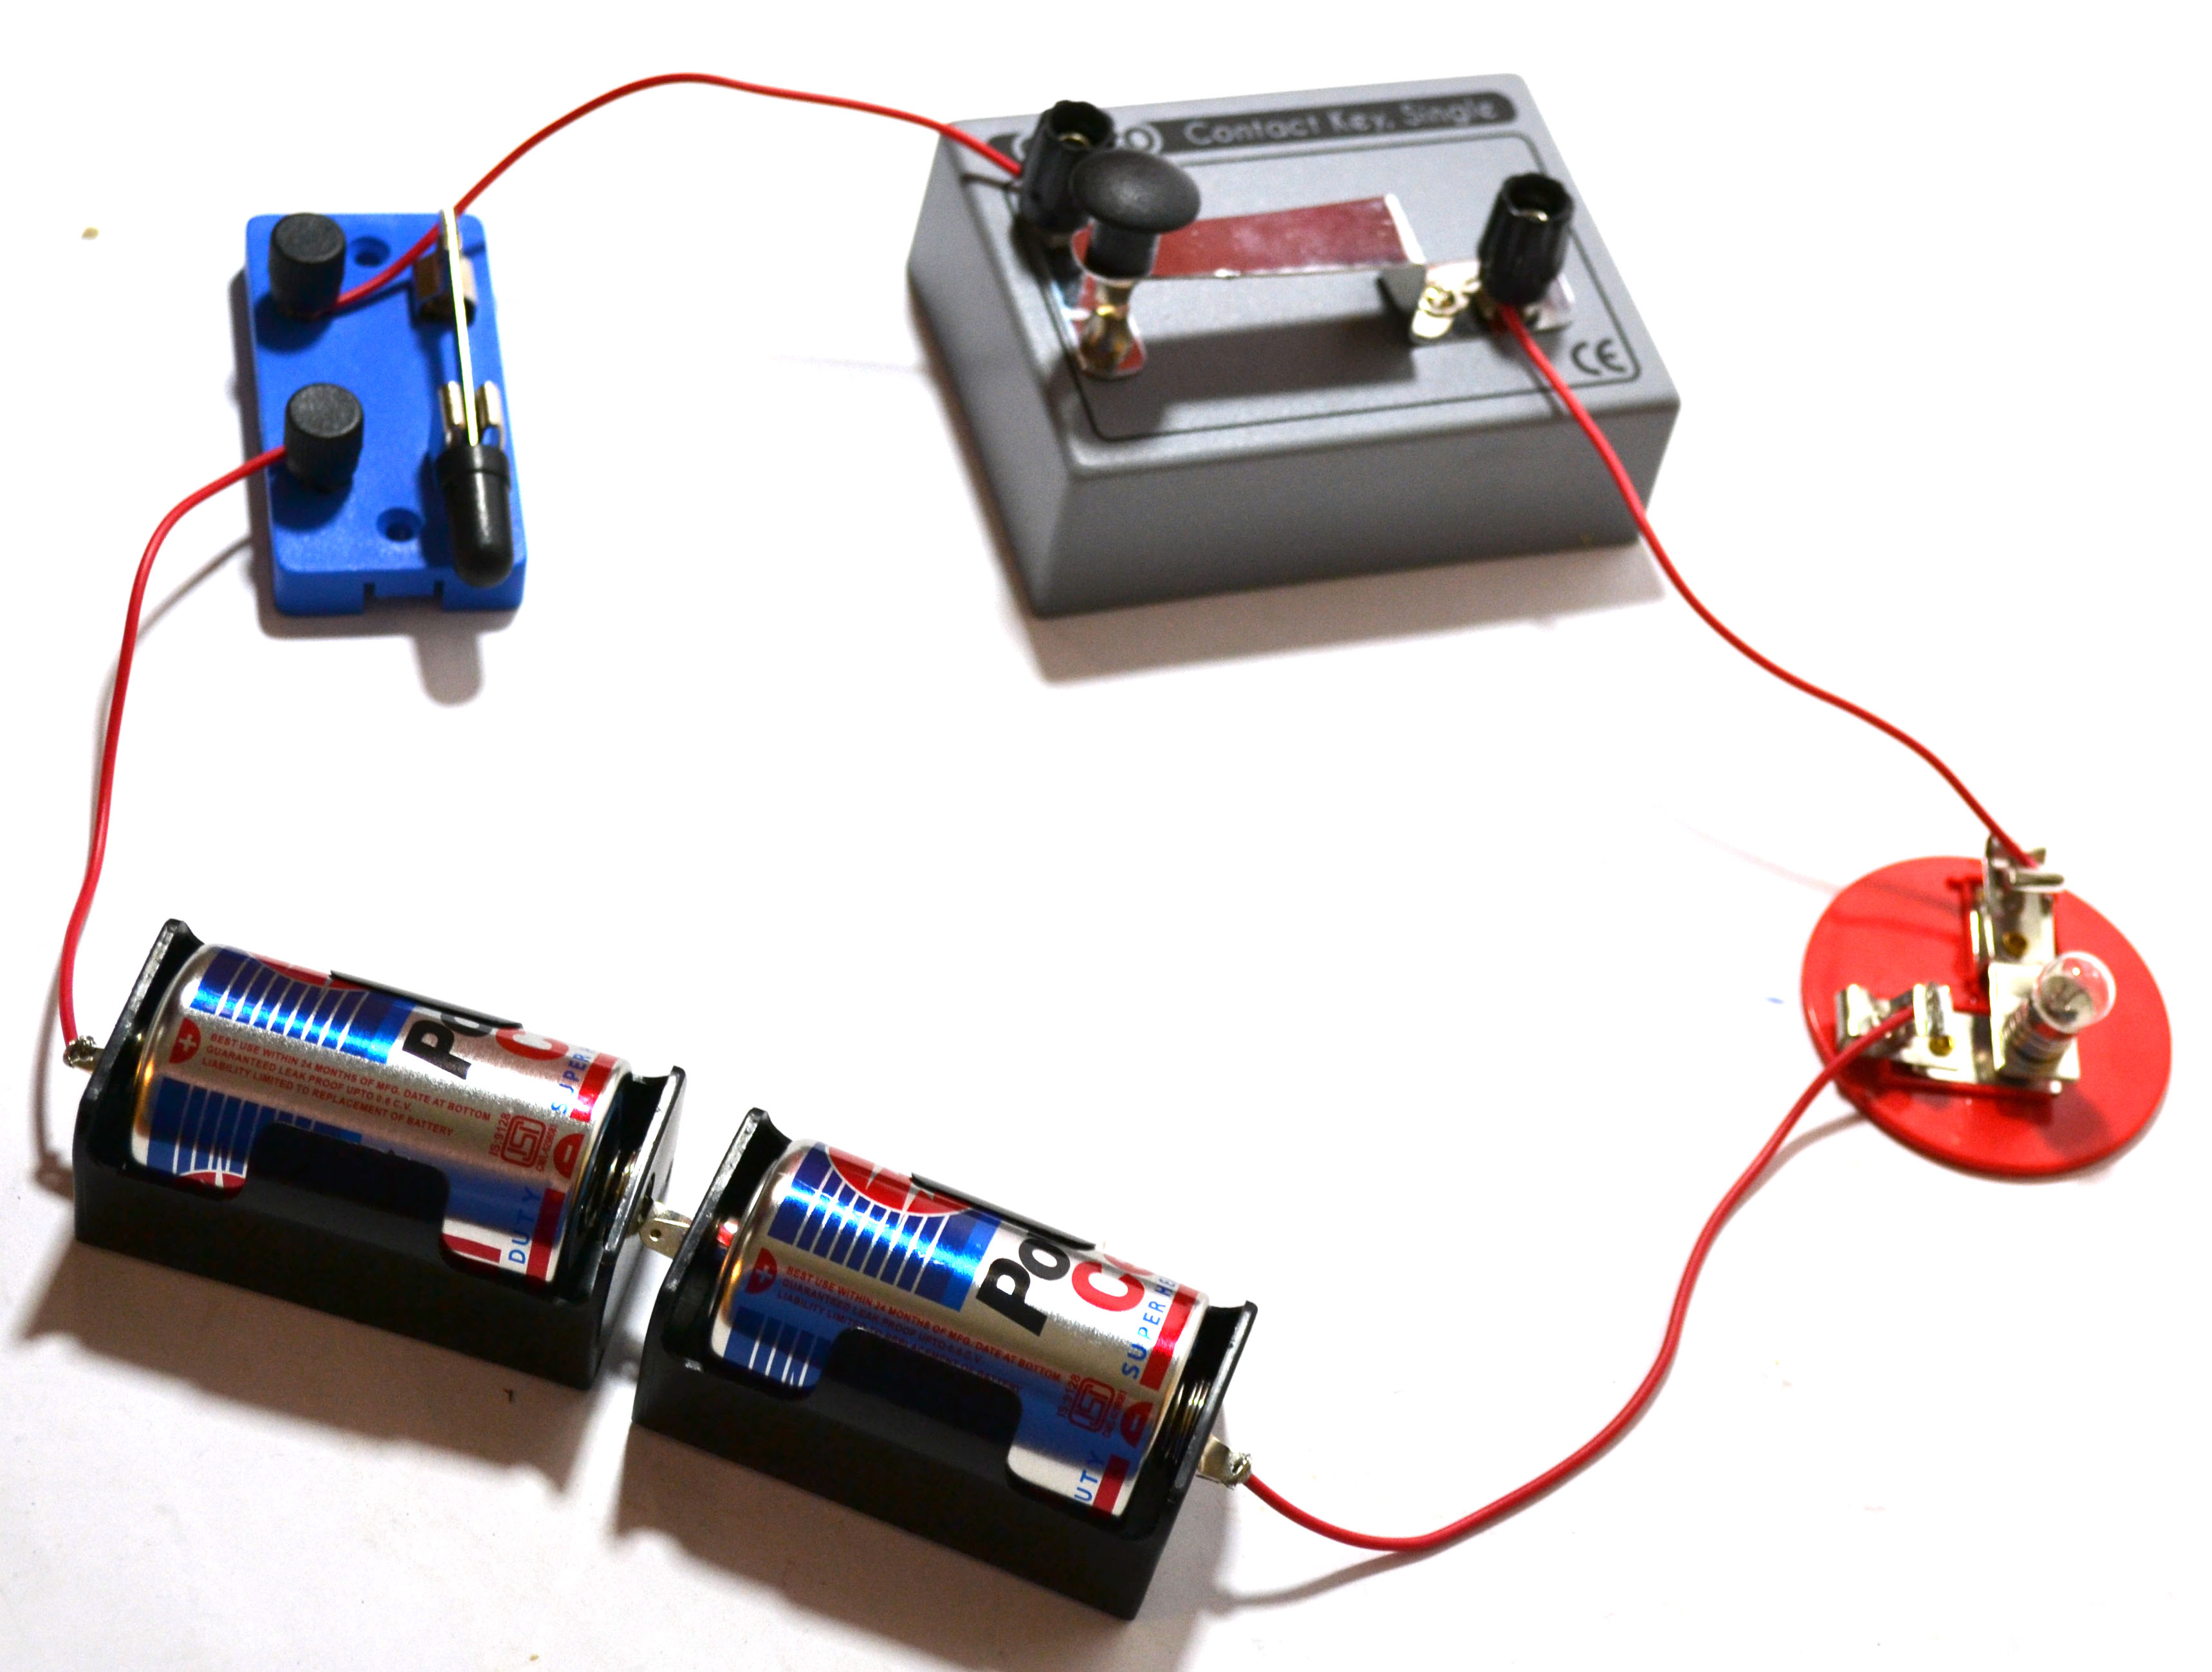 Eisco Basic Circuit Diy Kit Teaches Principles Of Circuitry And